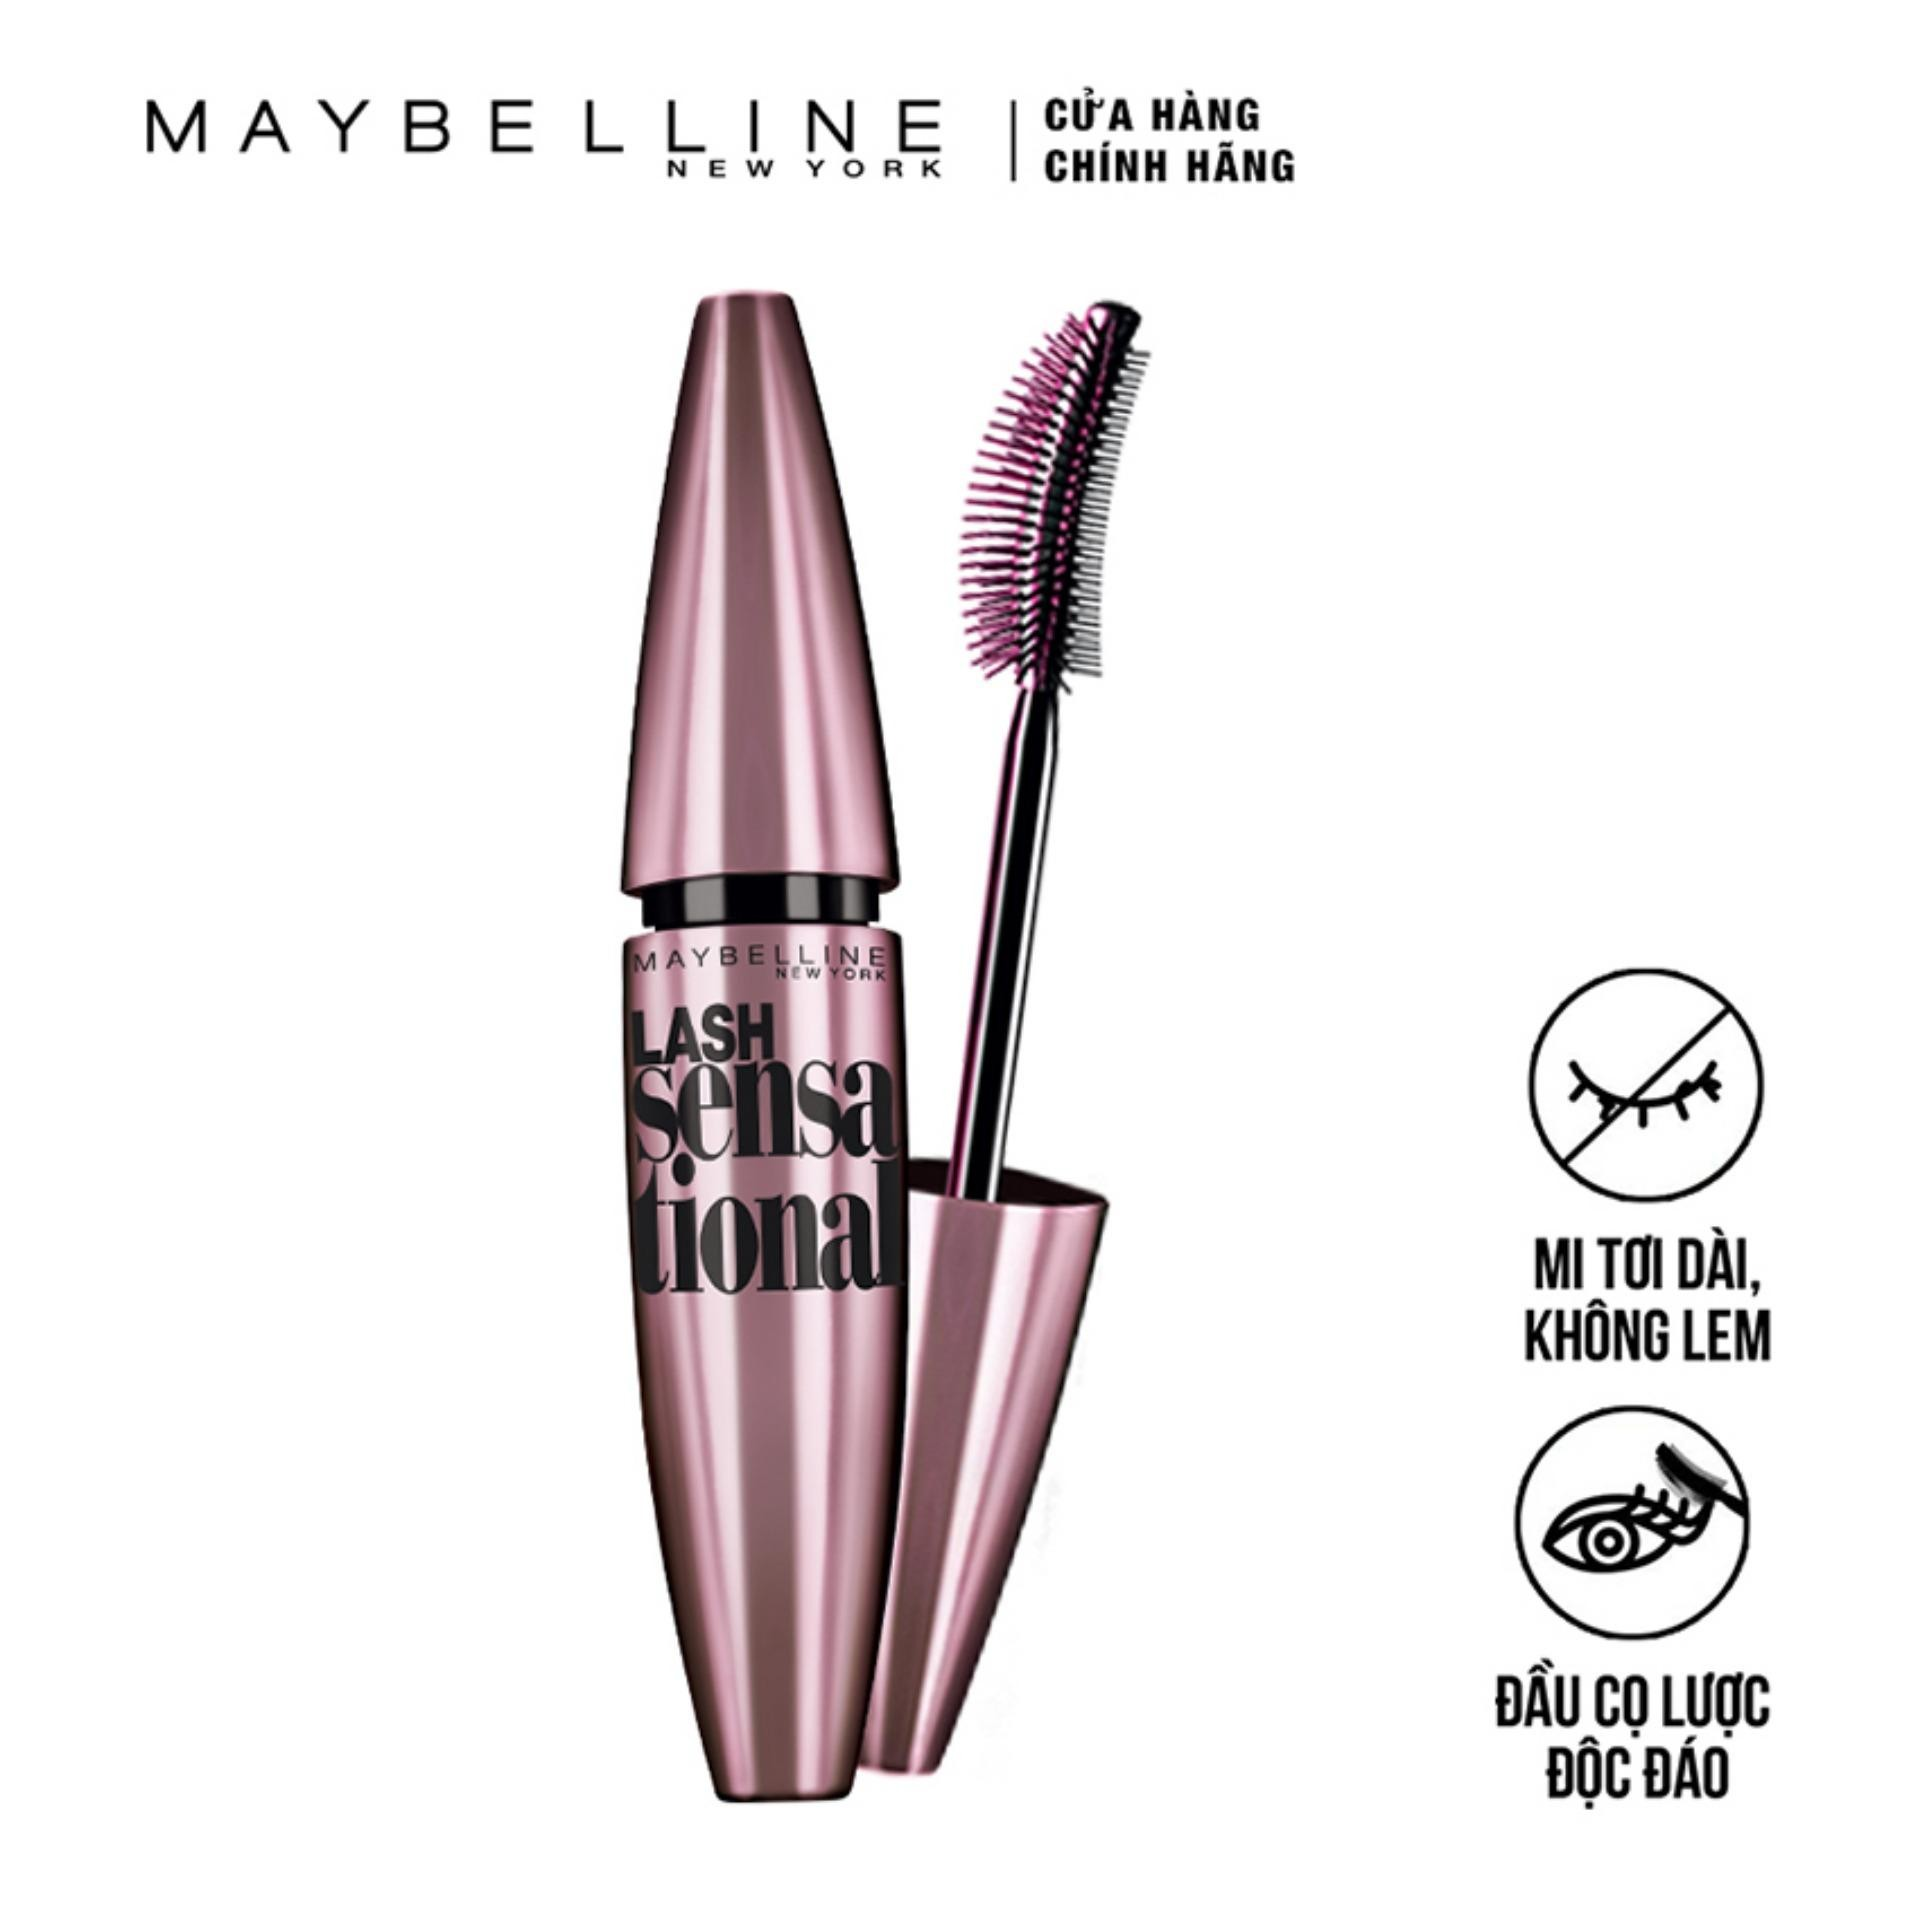 Mascara Maybelline Lash Sensational